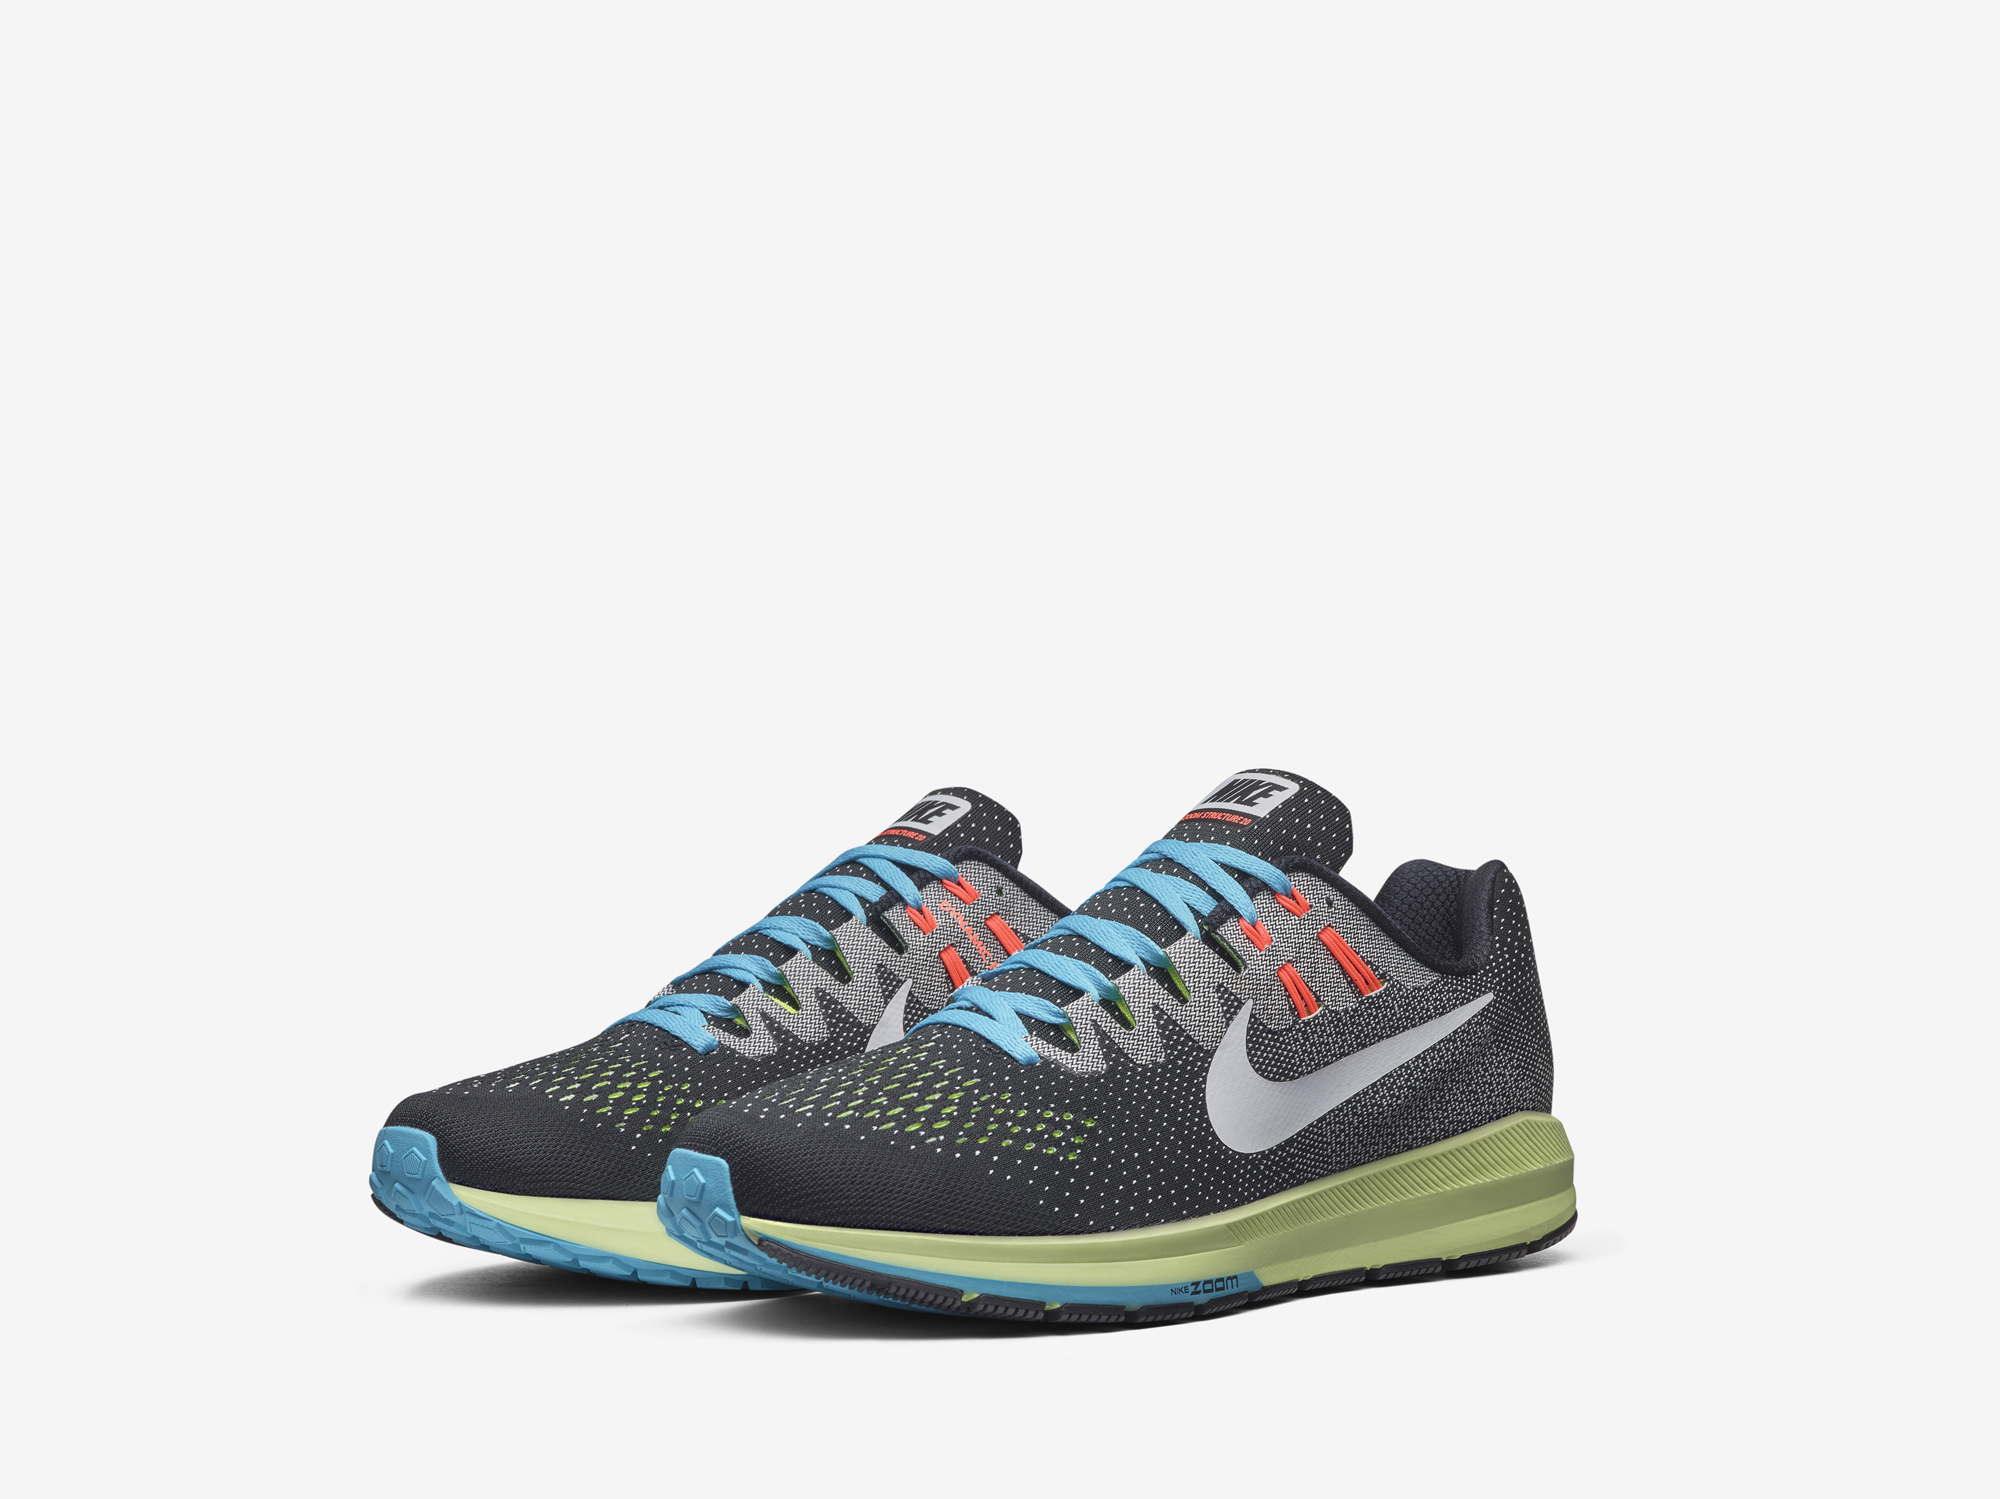 huge discount 3f1c7 ac621 Nike Lunarglide 9 upper order nike lunarglide 8 reddit ama 53 comments  share 53 comments share ho16rnsolarpackemstructure 20bty 77209 23cc6 ...